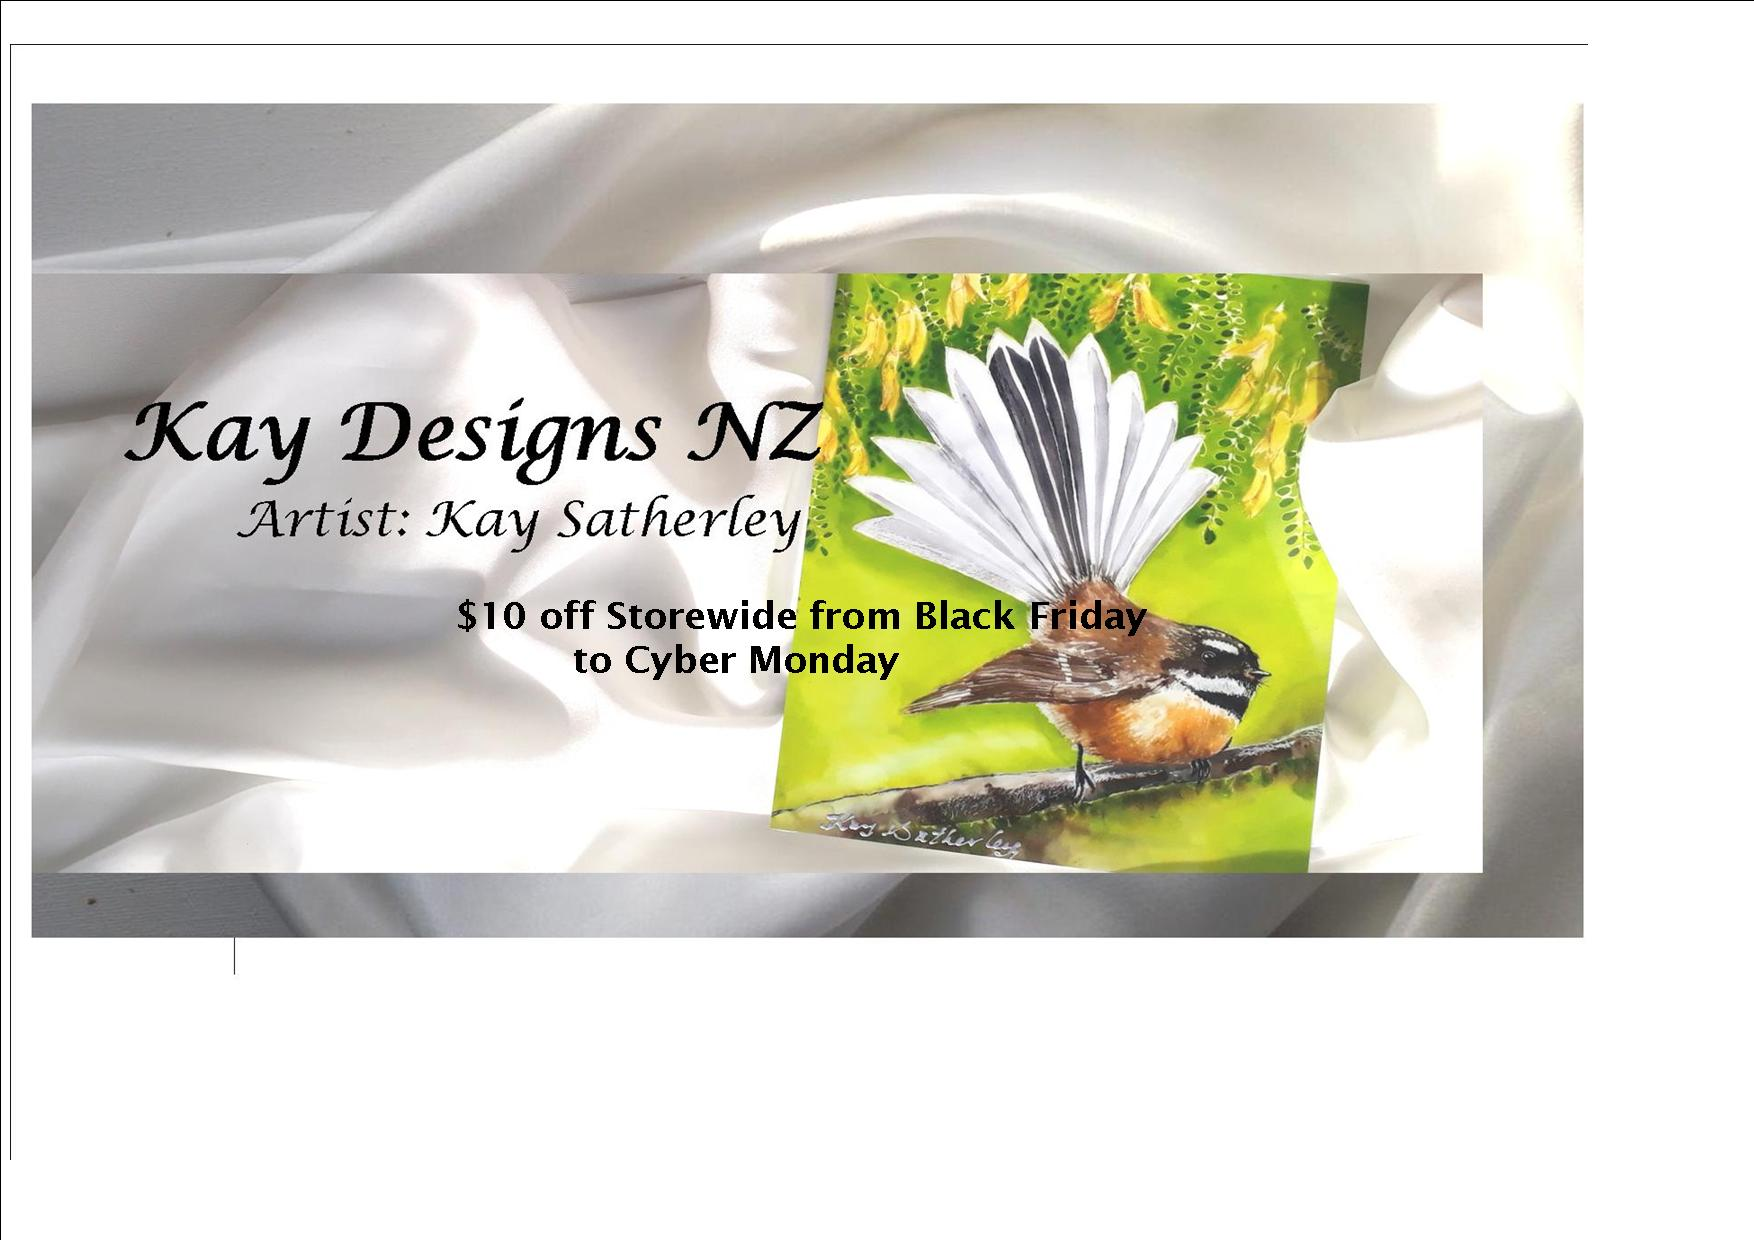 Kay Designs NZ